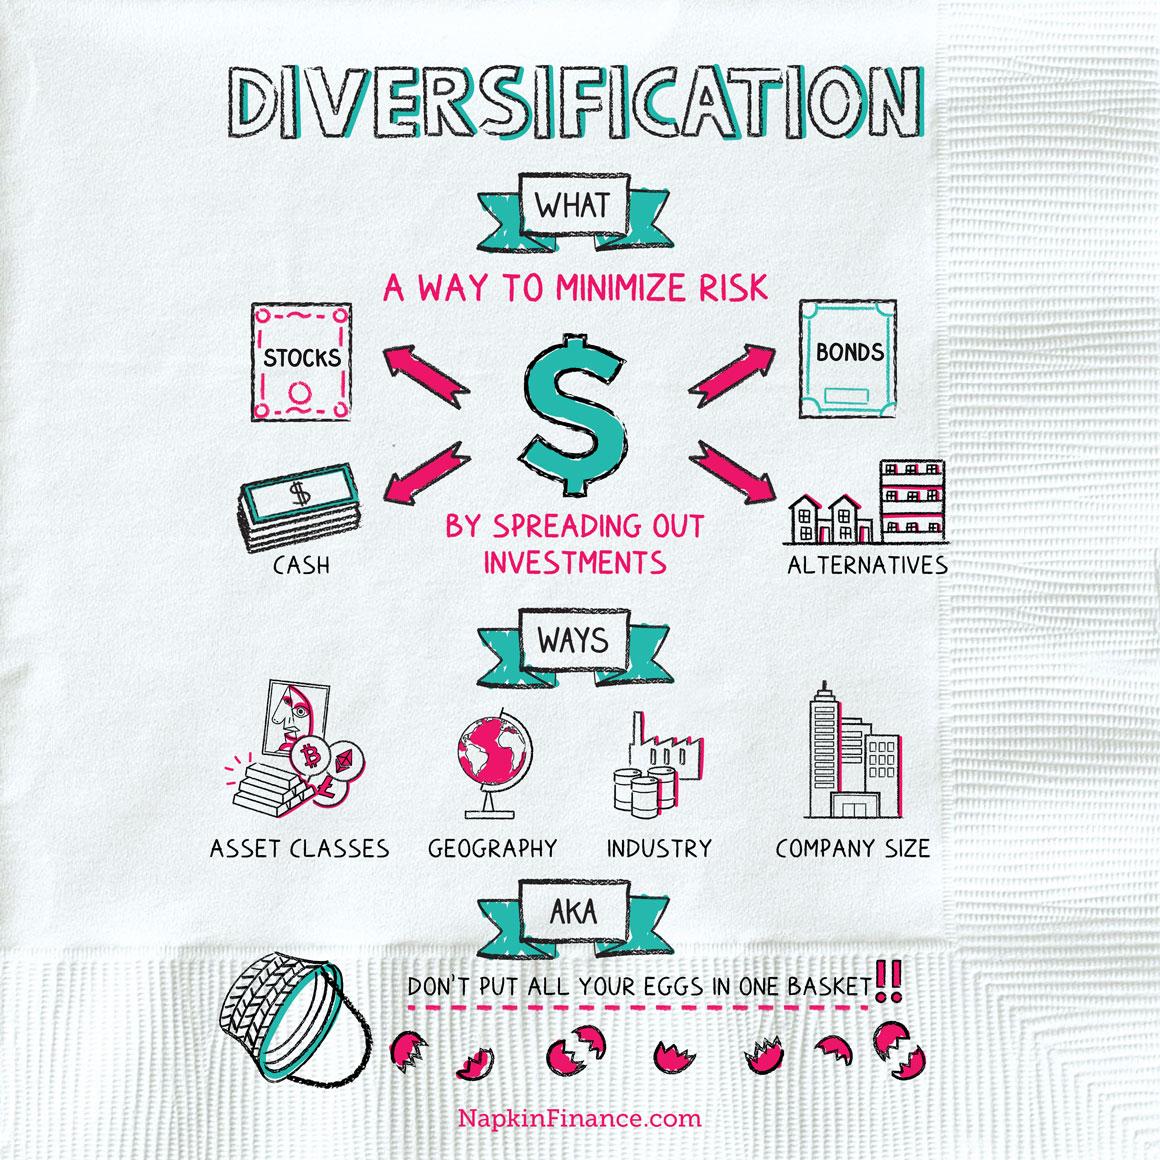 NapkinFinance-Diversification-Book-Napkin-